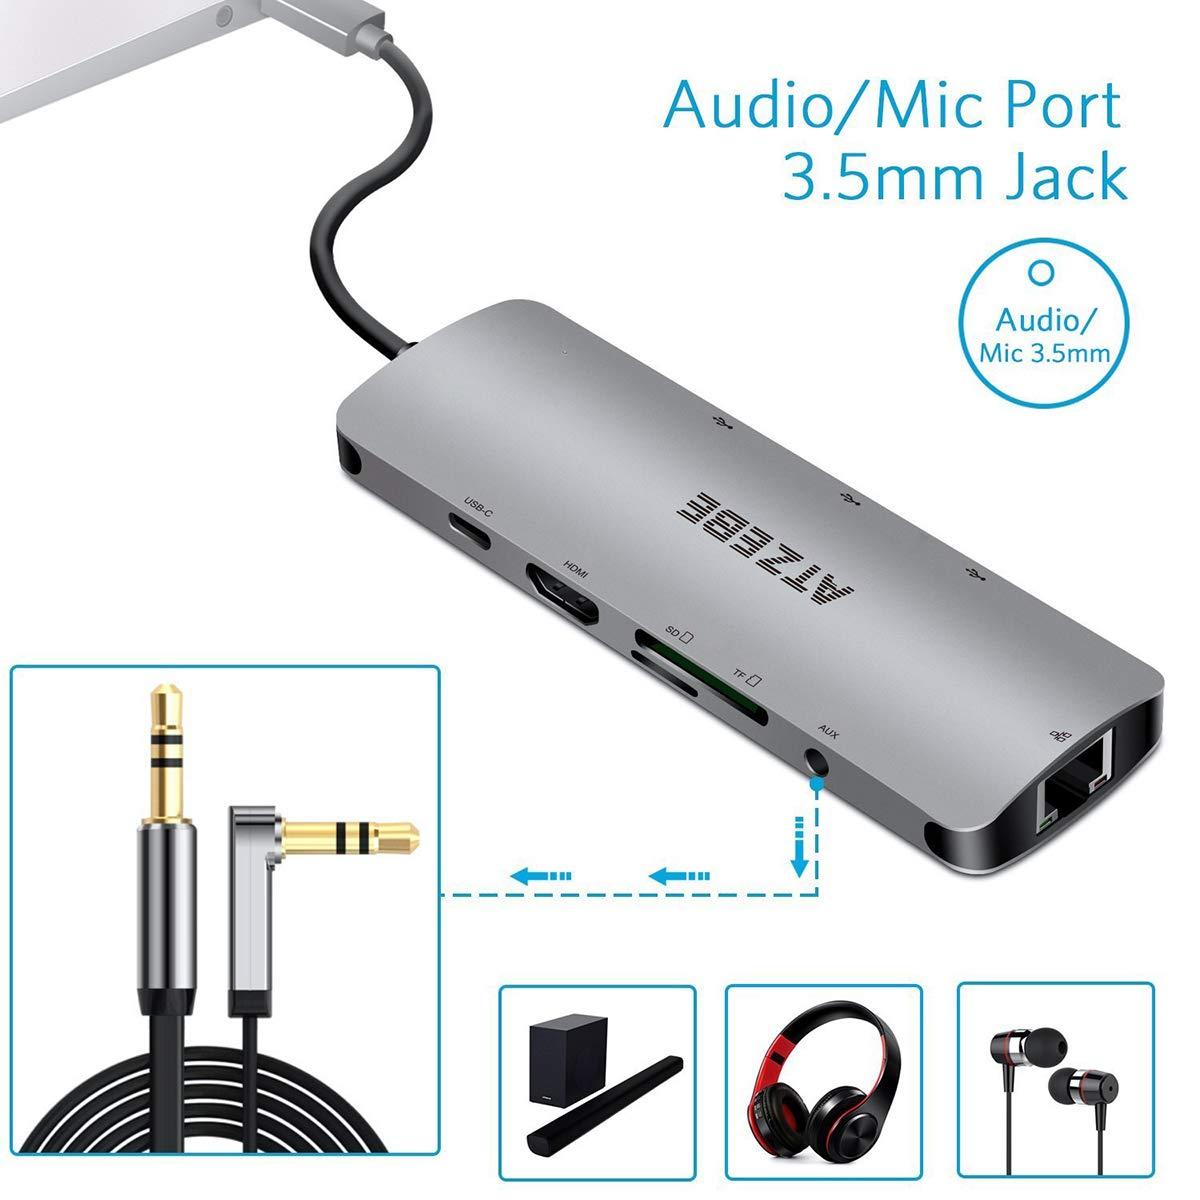 SD//TF Card Reader Type C Adapter with 4k HDMI USB C Power Delivery ATZEBE USB C Hub 3 USB 3.0 Ports Gigabit Ethernet